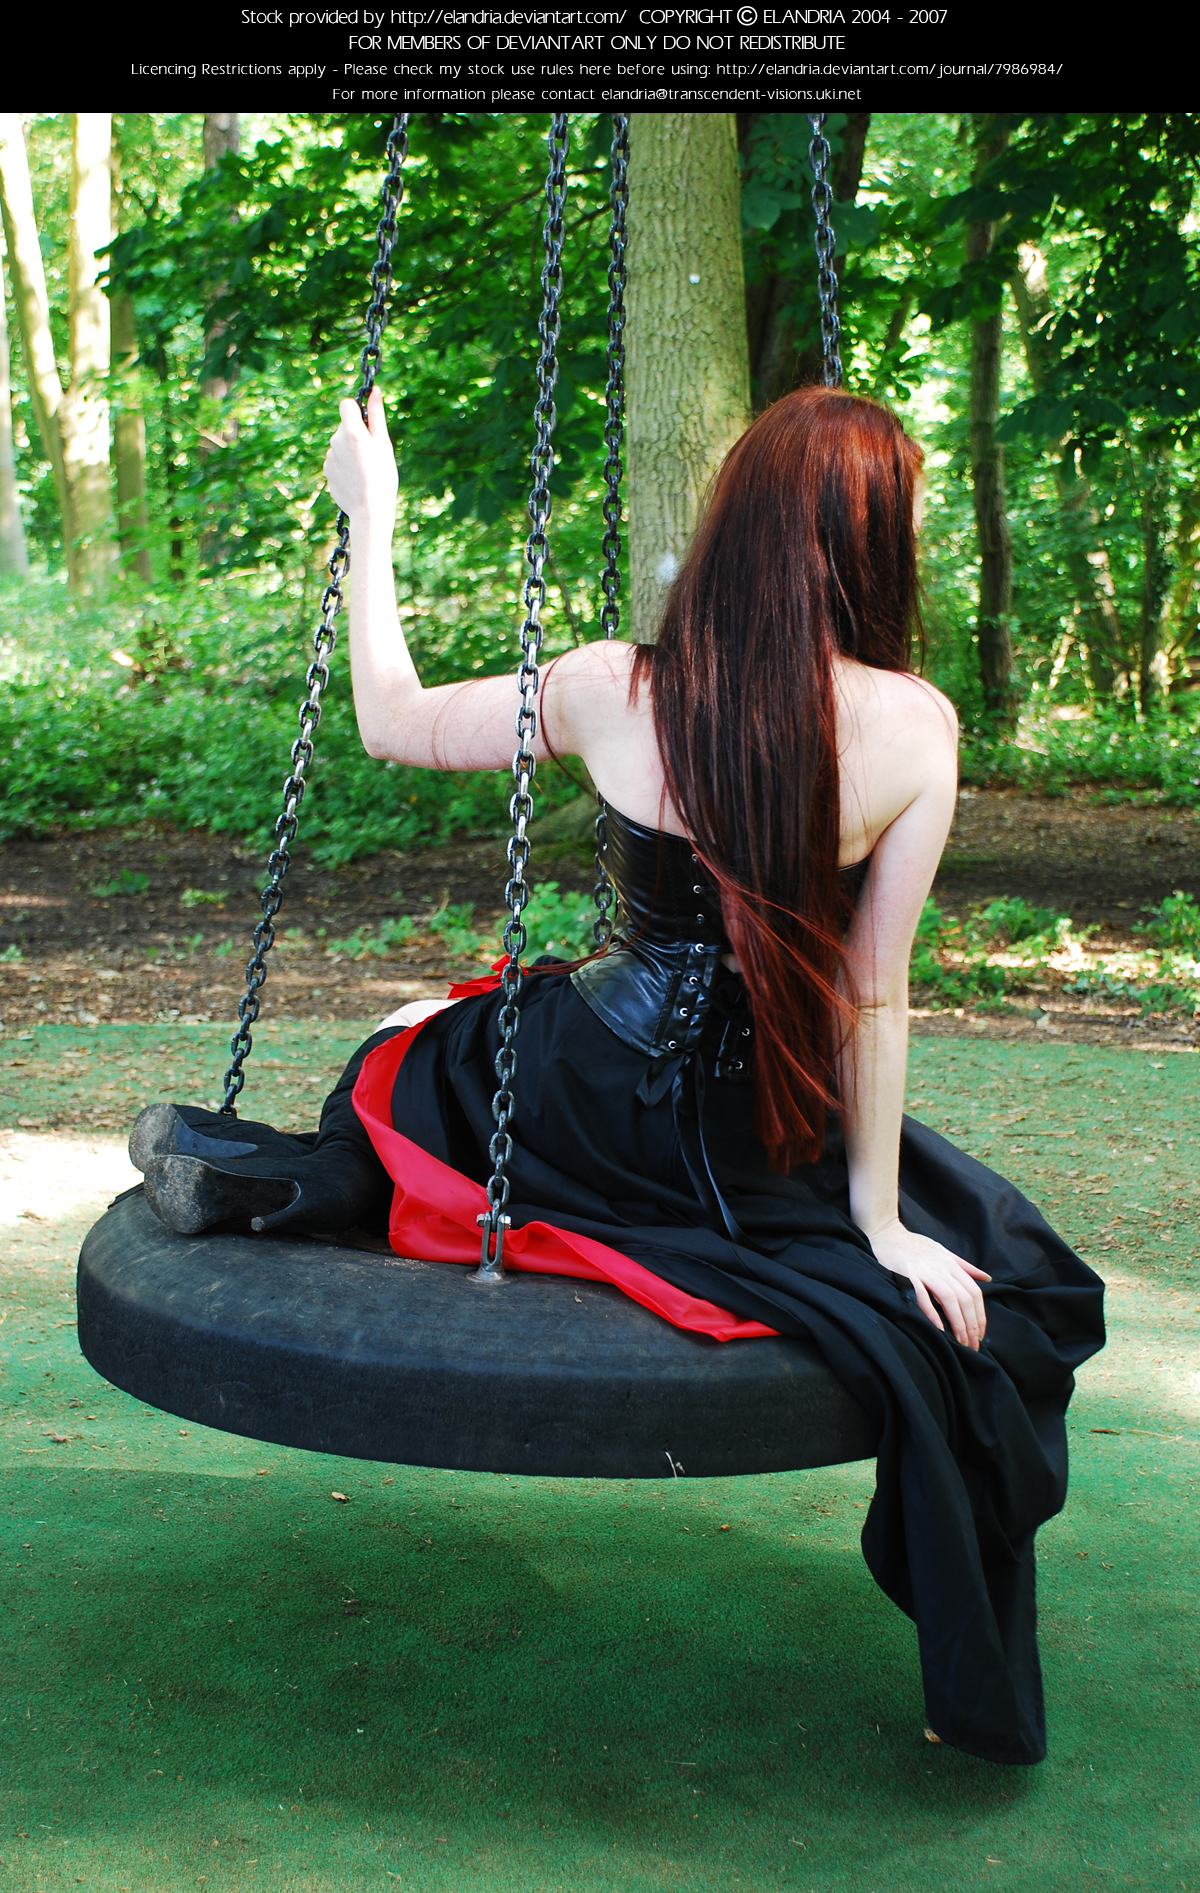 Hangin' Around 02 by Elandria